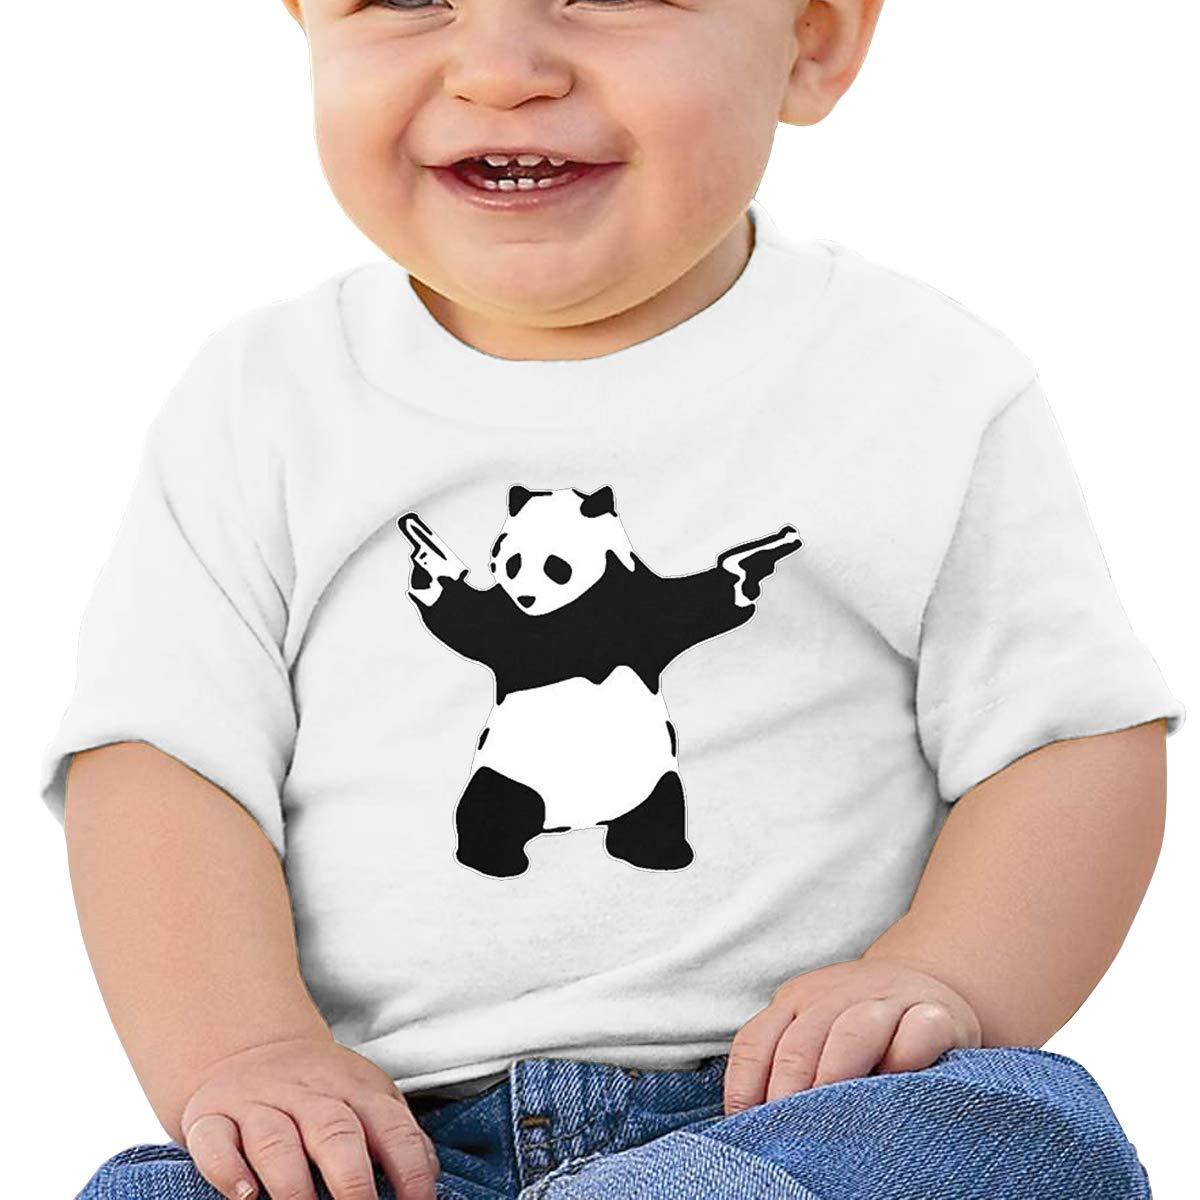 VAIJIAMAOYI 6-24 Month Baby T-Shirt European and American Banksy Panda Guns Baby Cute Infant 6-24 Month Cotton T-Shirt White